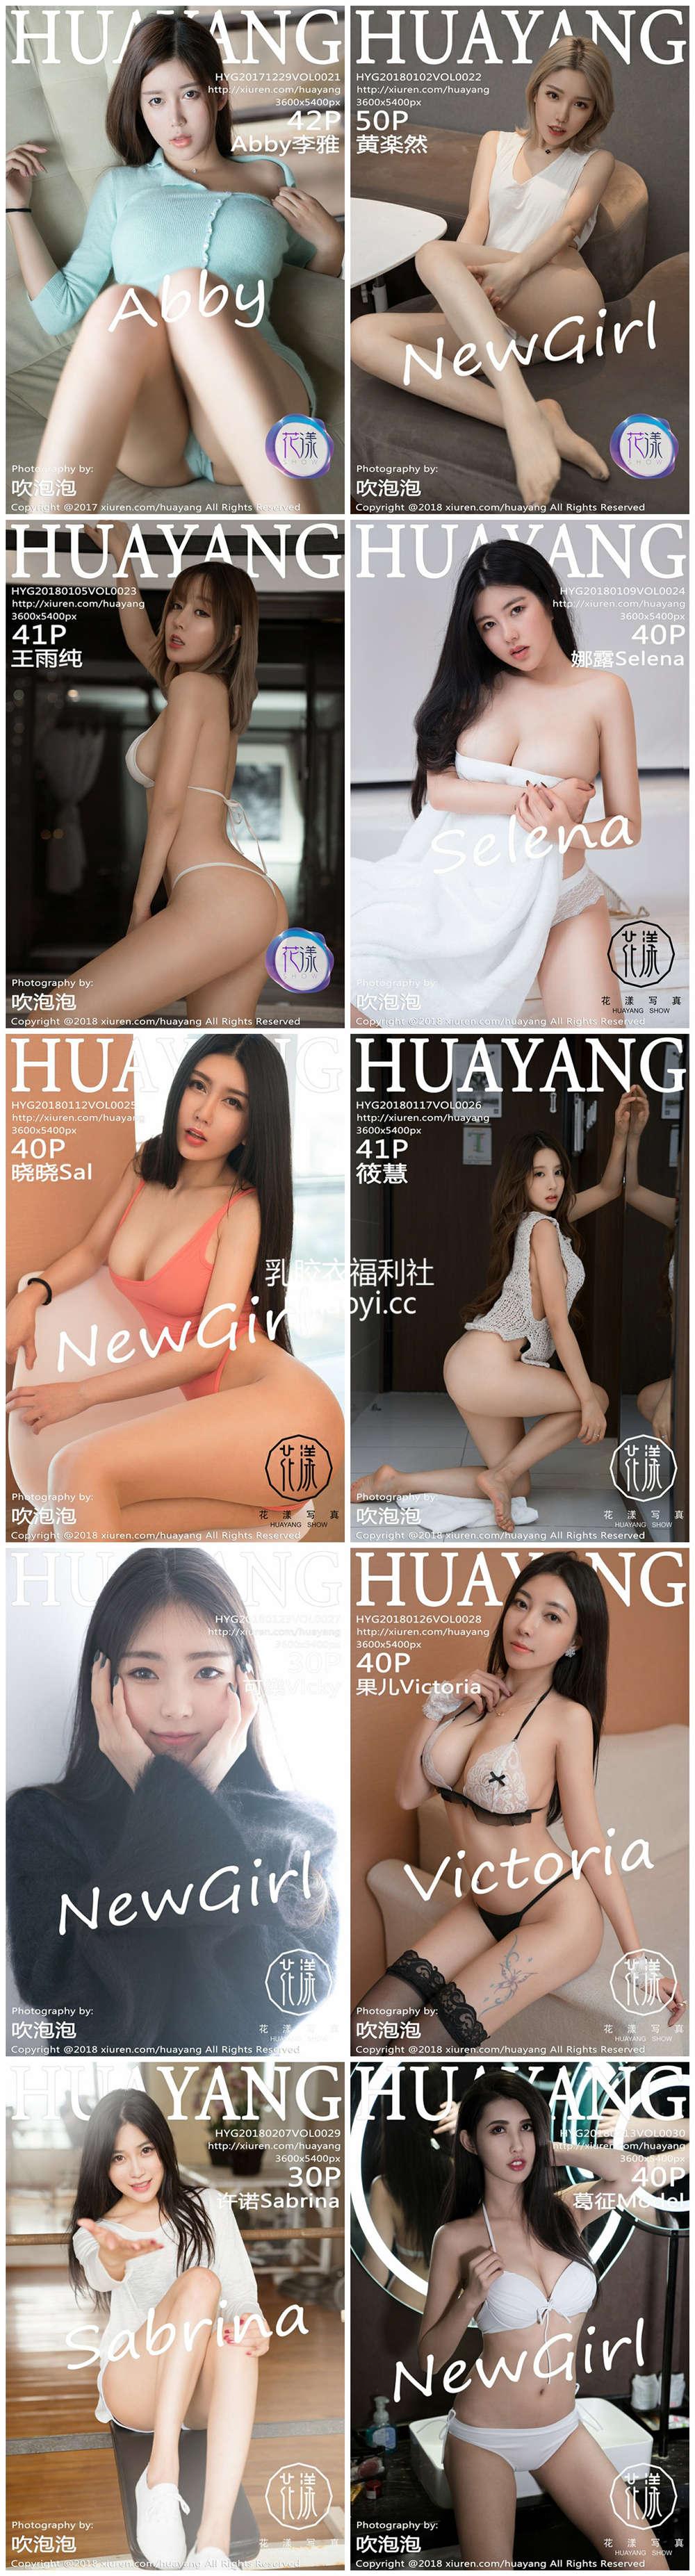 [HuaYang花漾] Vol.021-030 秀人系列 10期性感写真百度云合集下载